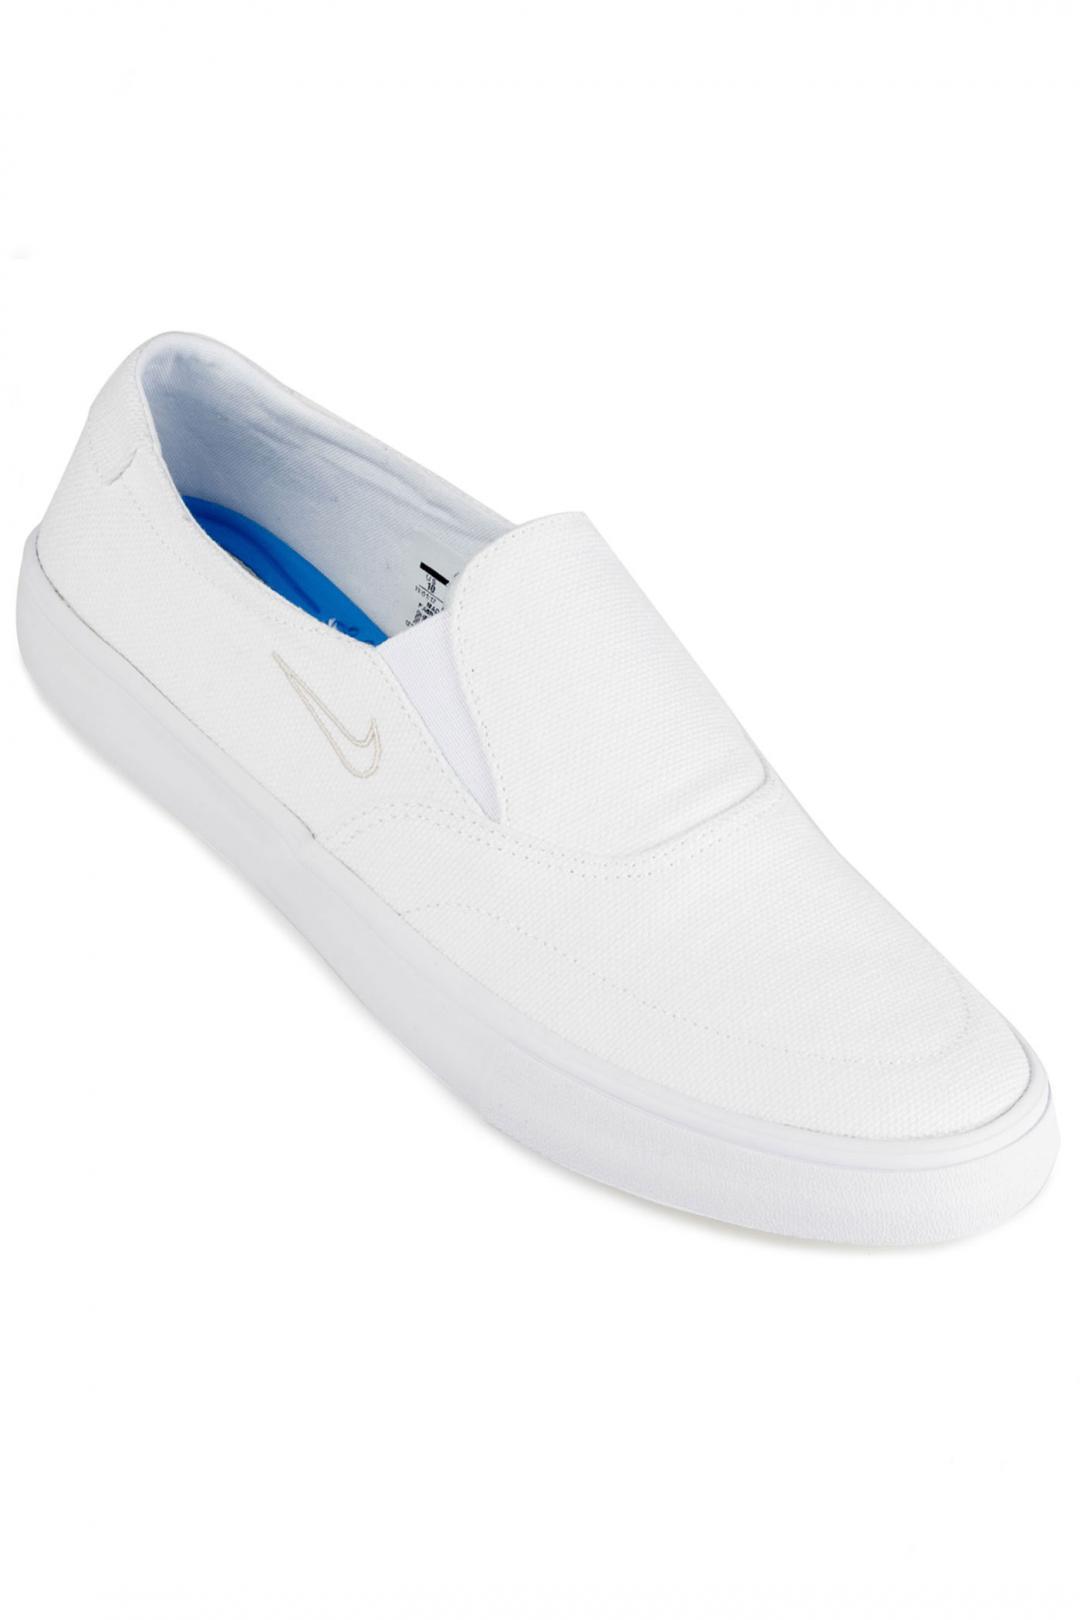 Uomo Nike SB Portmore II Solarsoft Slip white white   Sneakers slip on